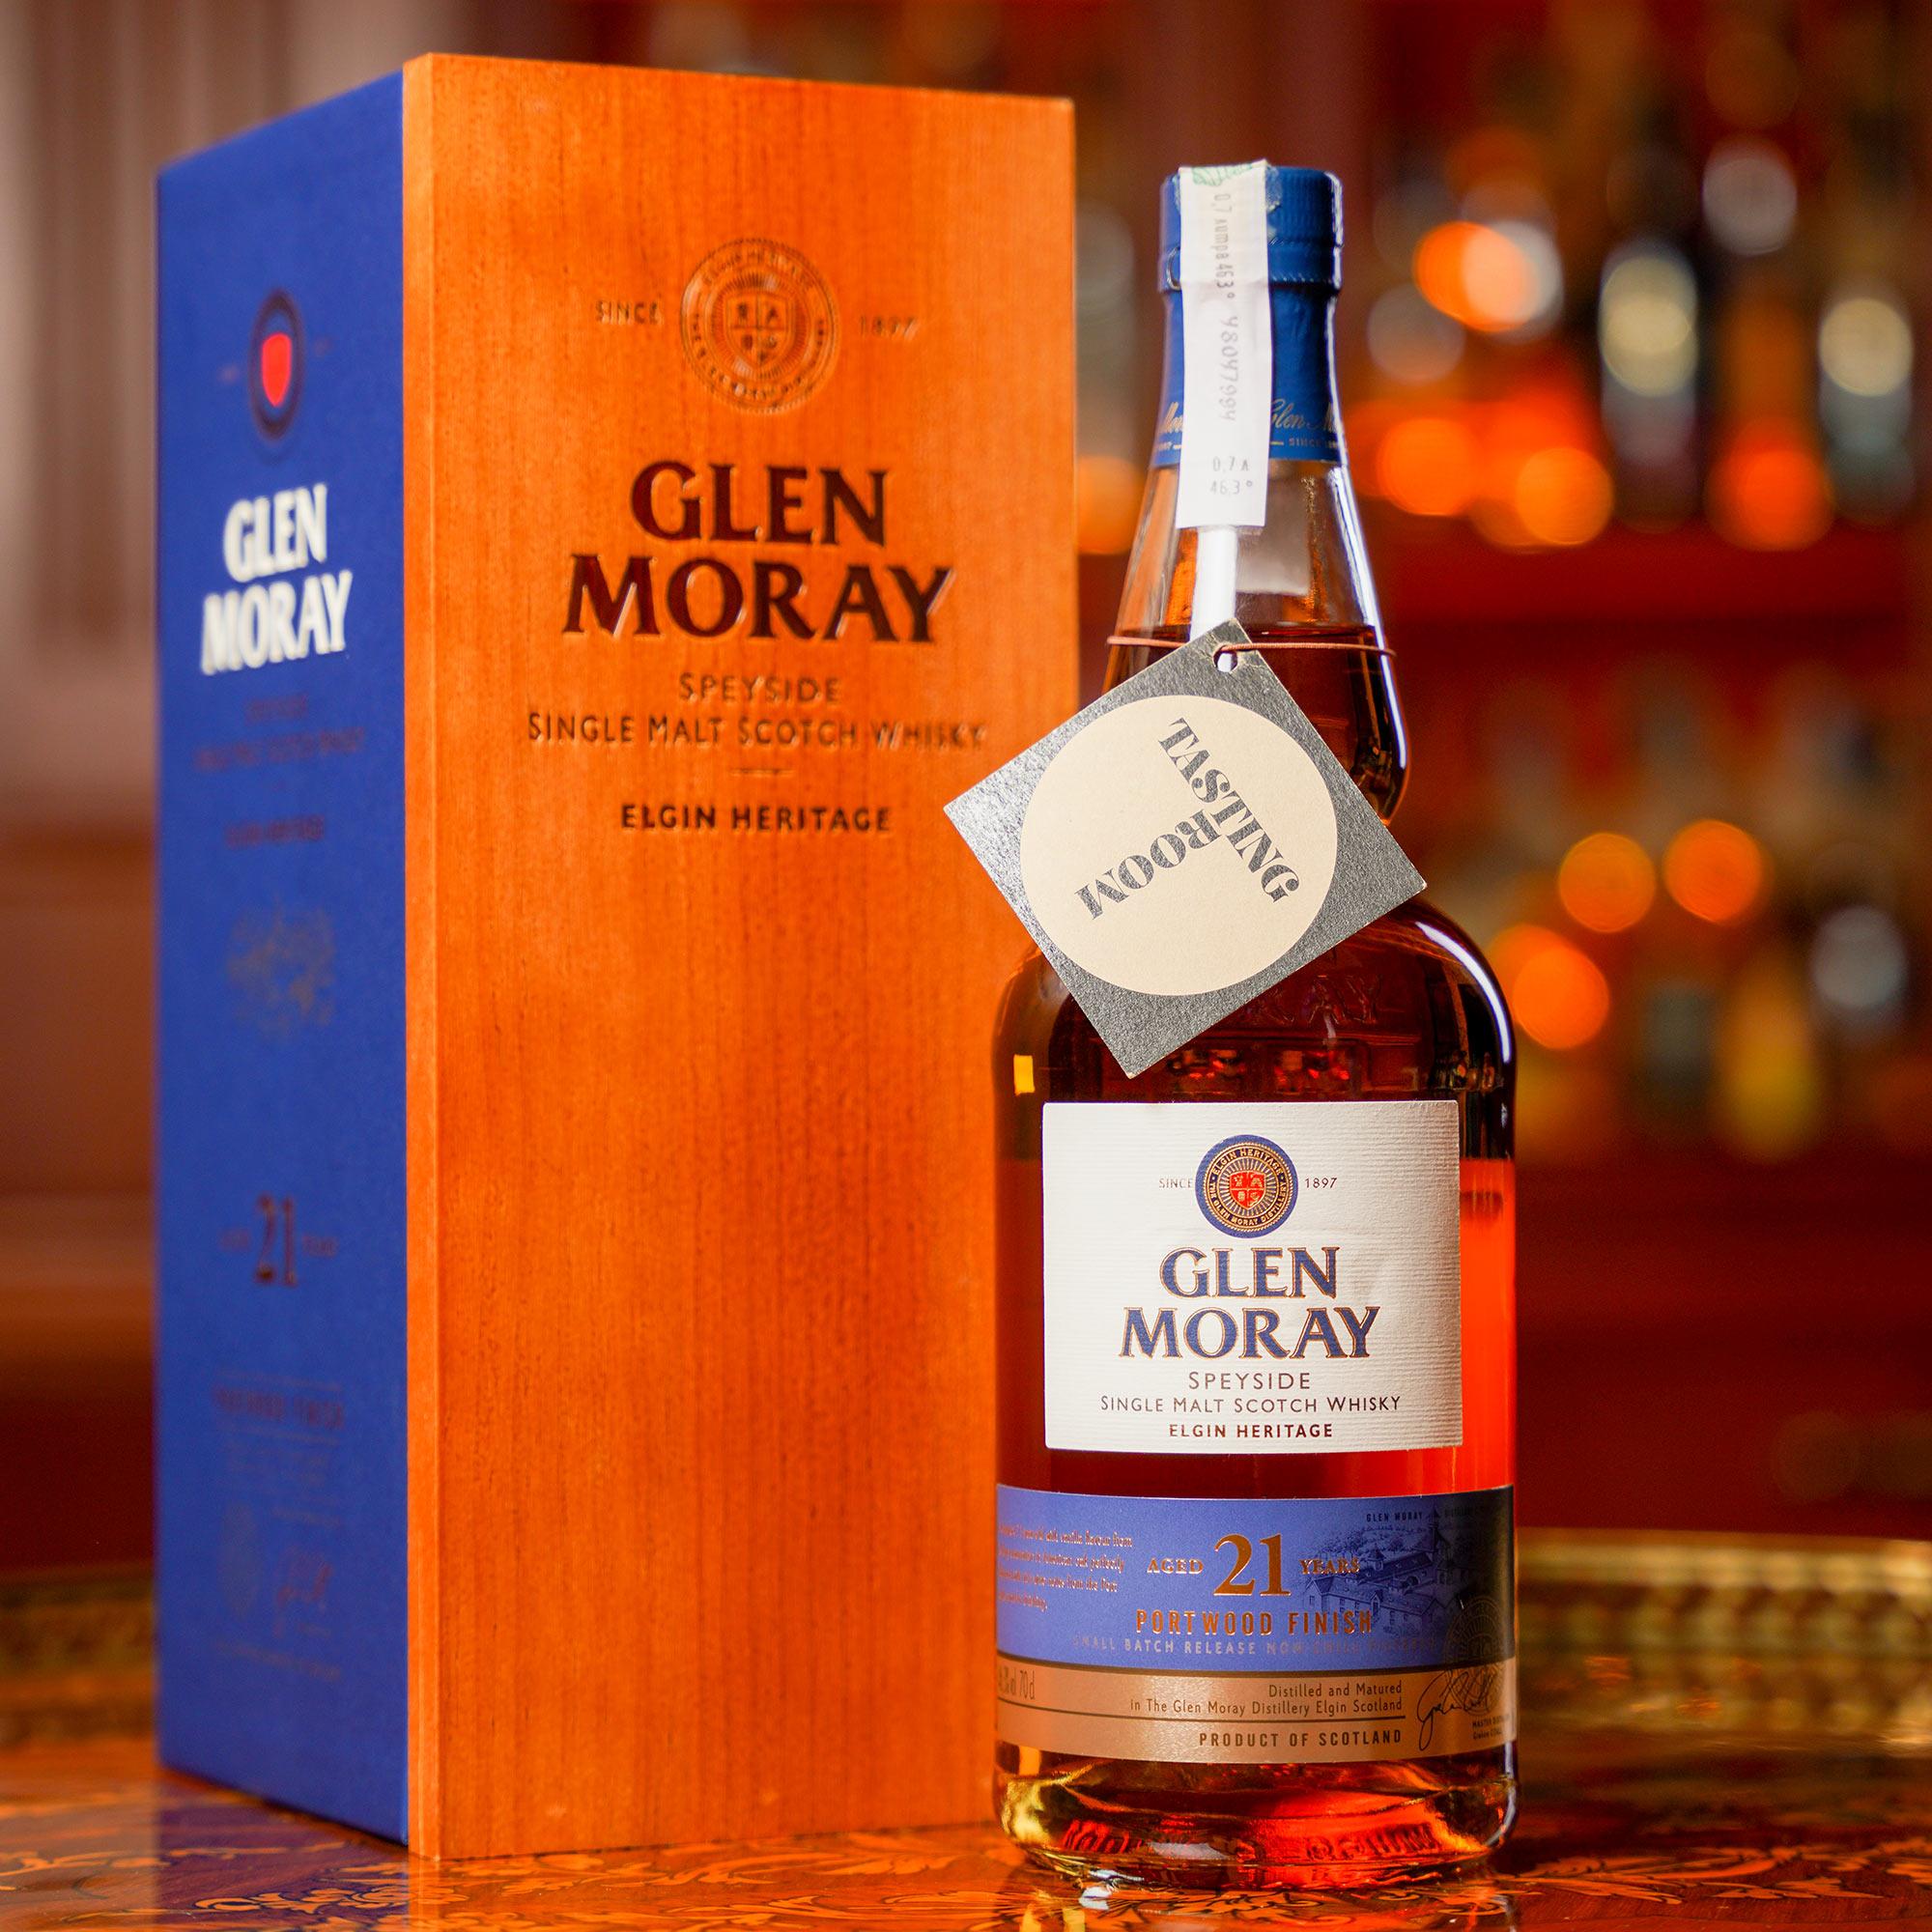 Glen Moray 21 YO /Глен Морей 21 годишен Порт ууд финиш